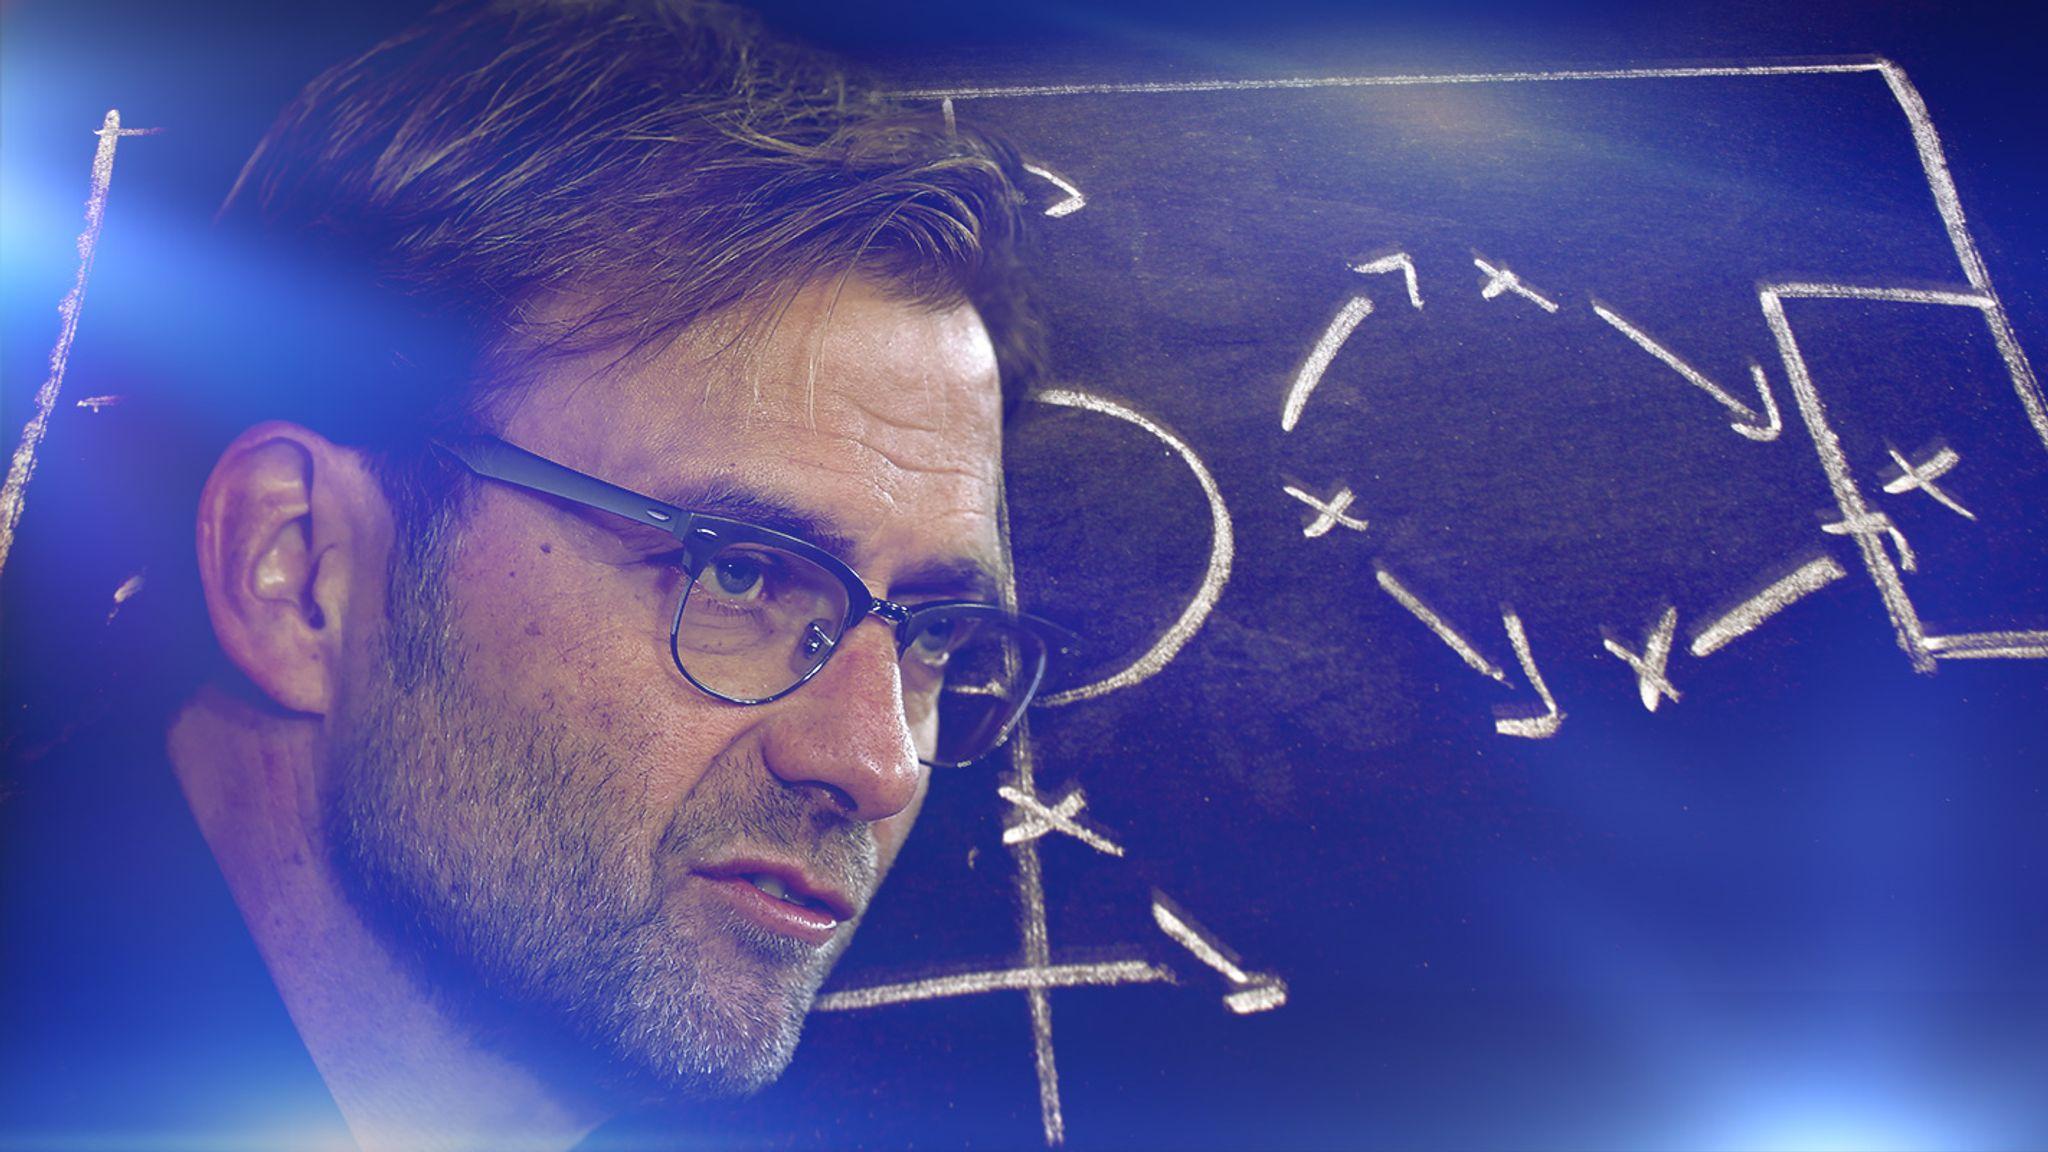 Why Jurgen Klopp's gegenpressing with Dortmund was revolutionary | Football  News | Sky Sports